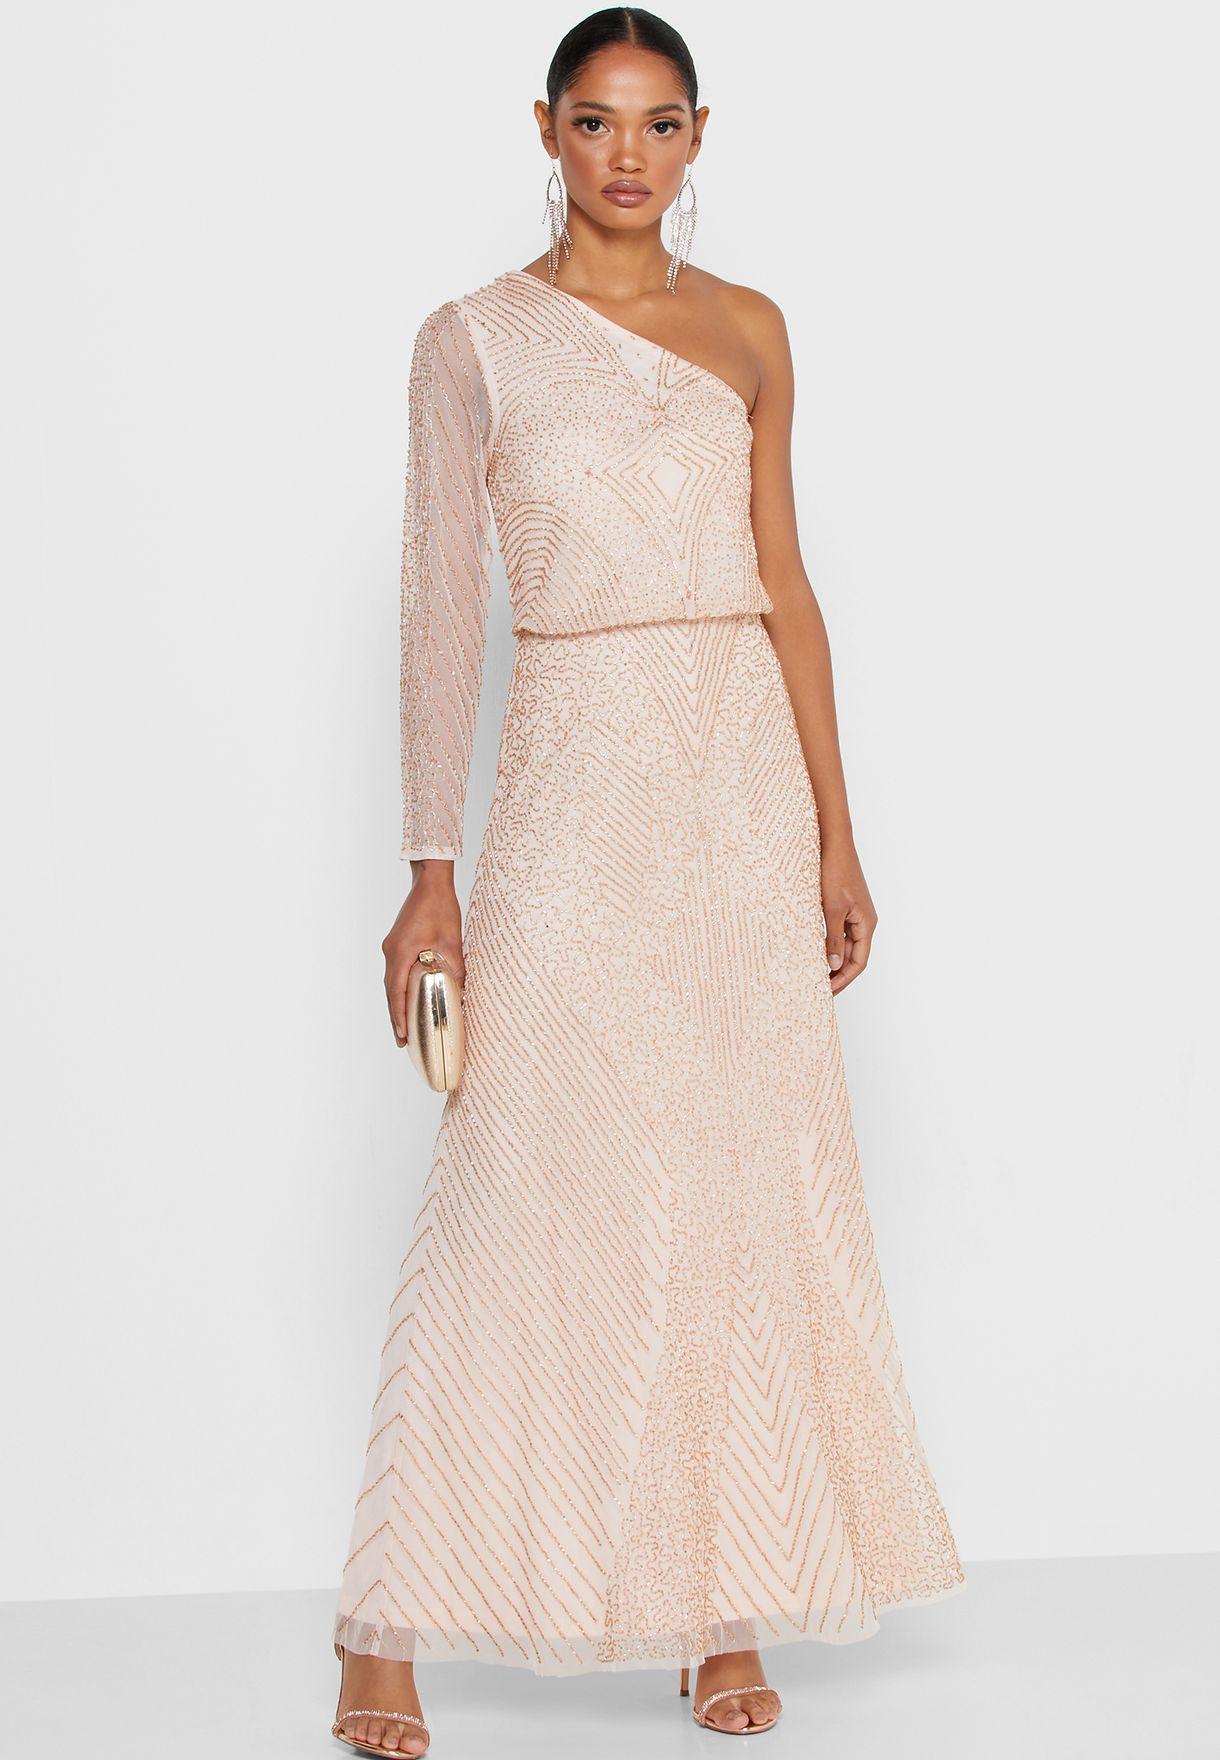 Buy Miss Selfridge Petite Pink One Shoulder Shimmer Dress For Women, Uae 20960at92eup